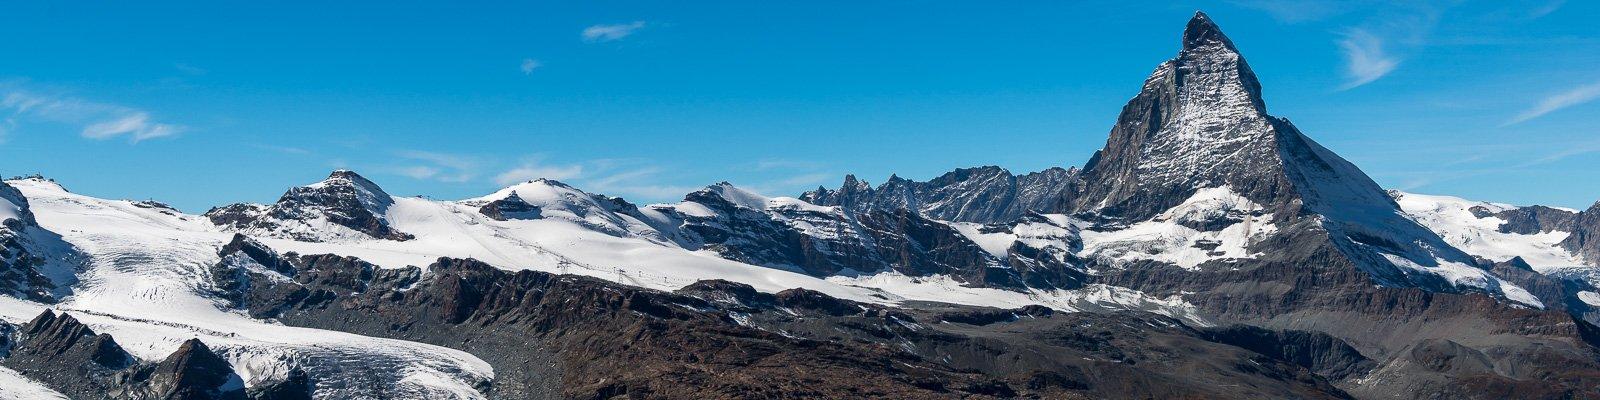 321-Zermatt-header